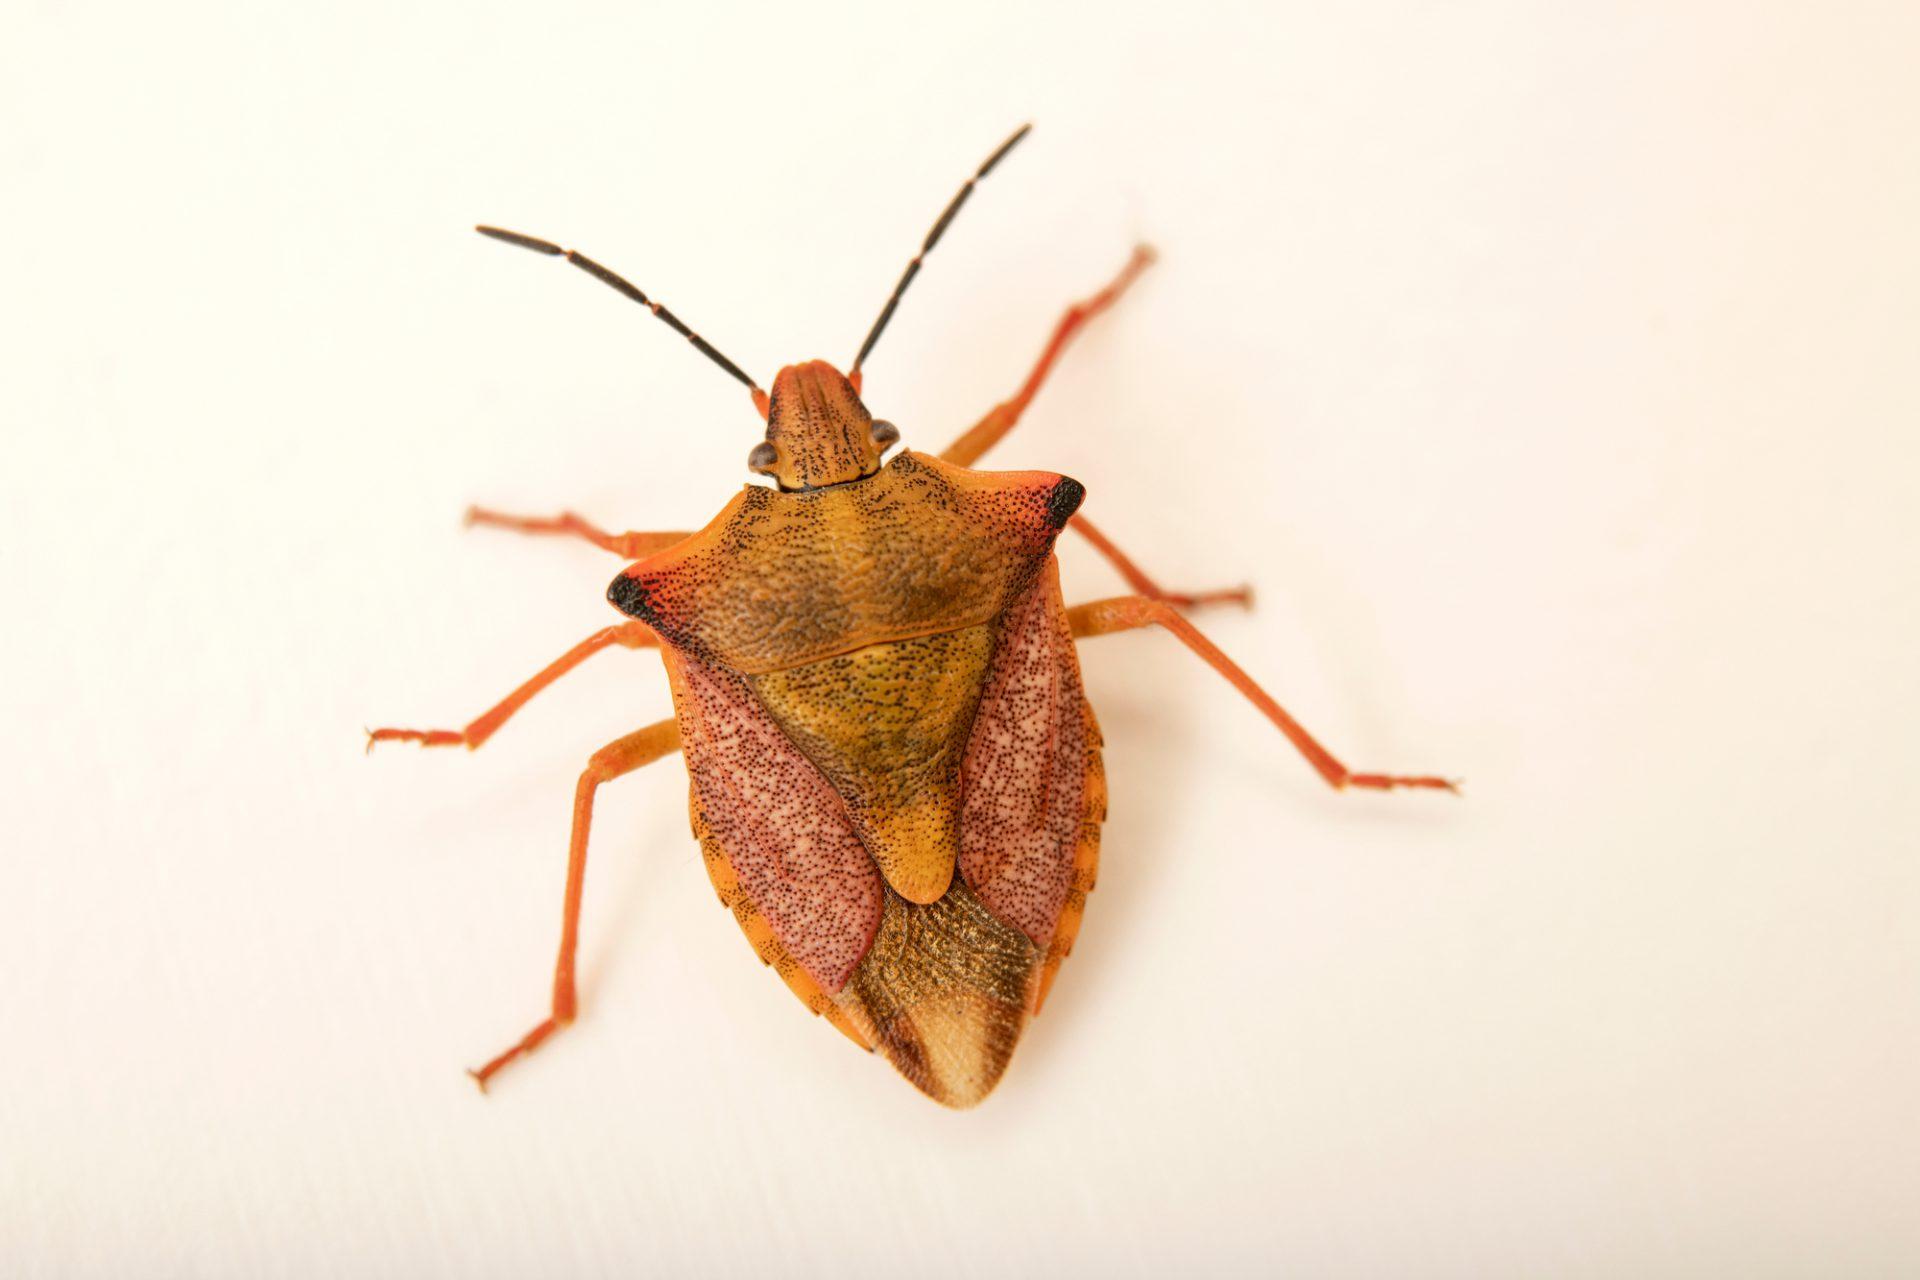 Photo: Red shield bug (Carpocoris mediterraneus) at Graham's Quinta dos Malvedos Vineyard.